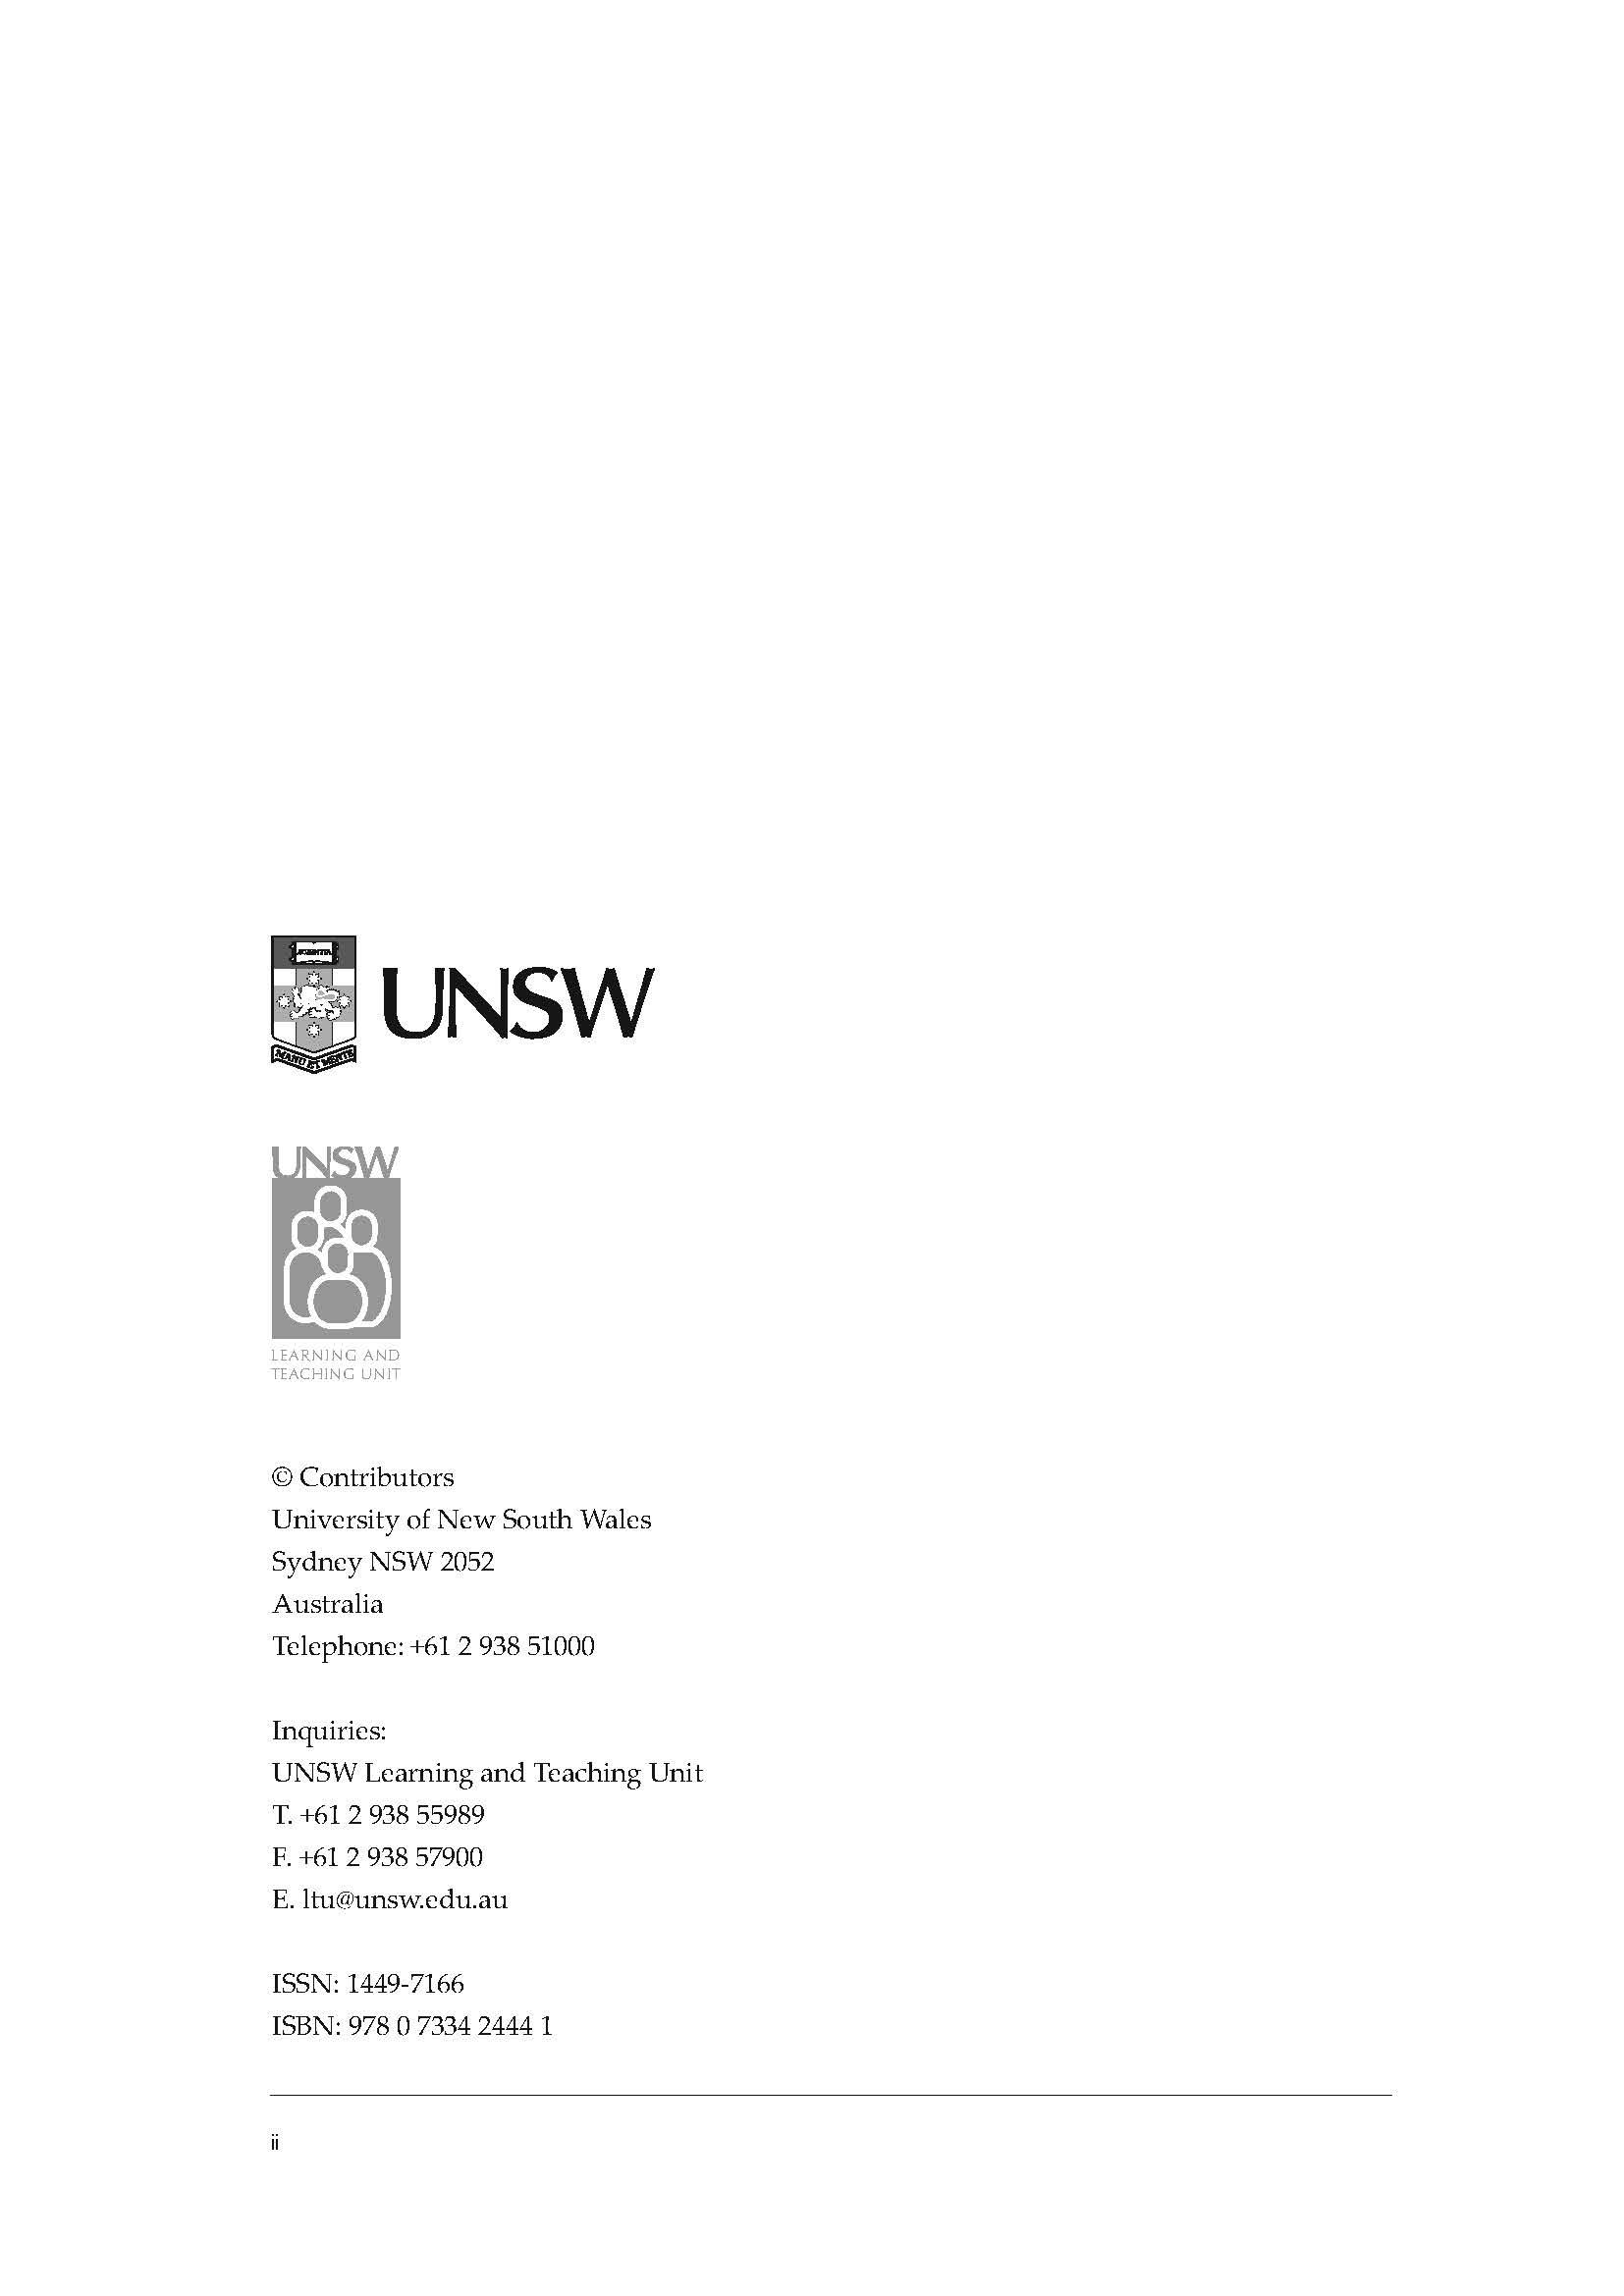 UNSW_Compendium_Issue4_Feb07_Page_2.jpg